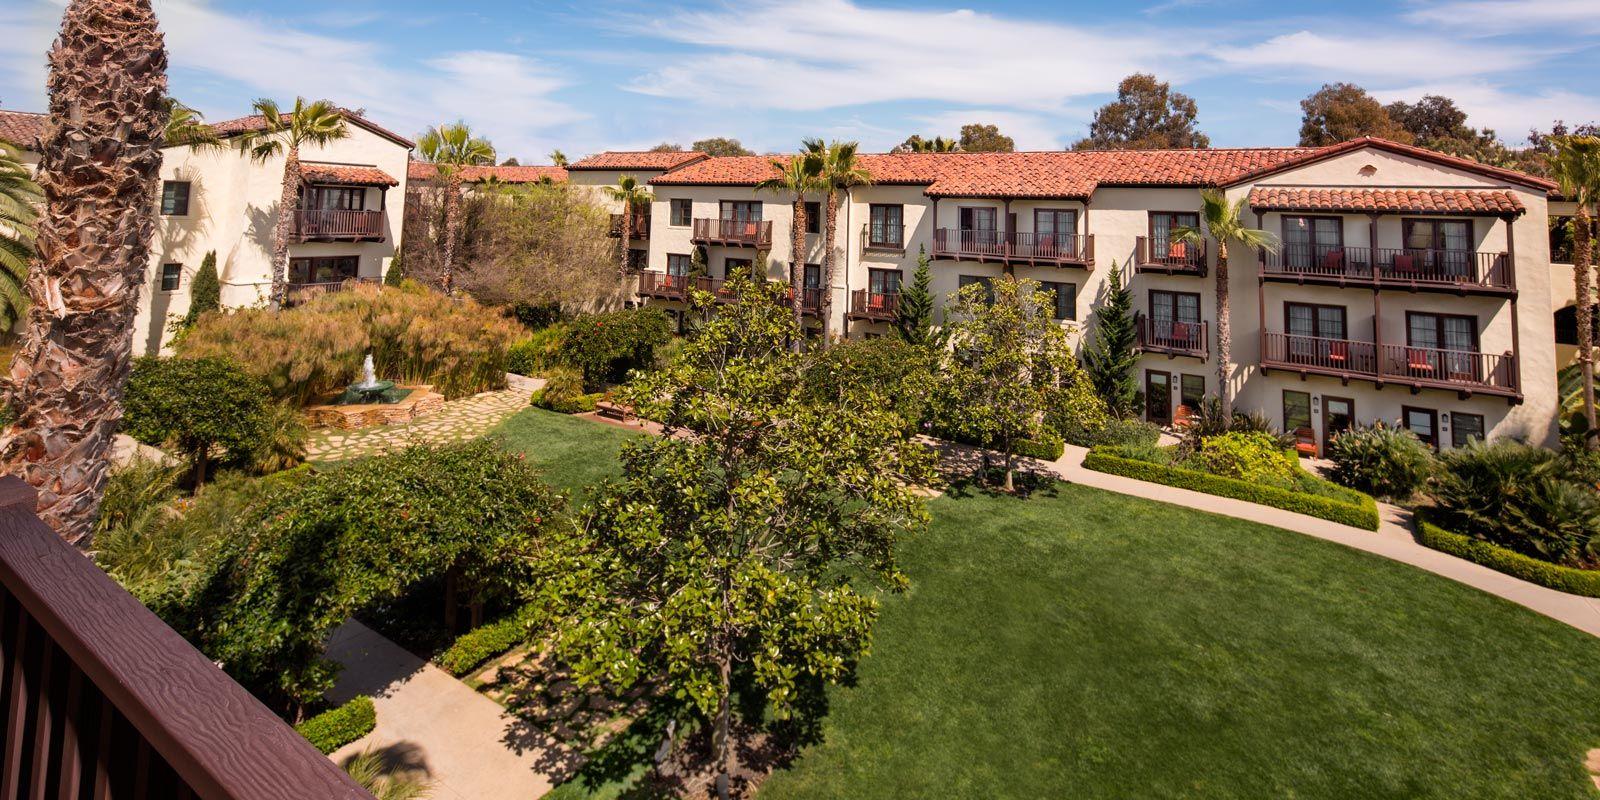 San Diego Luxury Resorts | La Jolla Resort | Estancia La Jolla Hotel